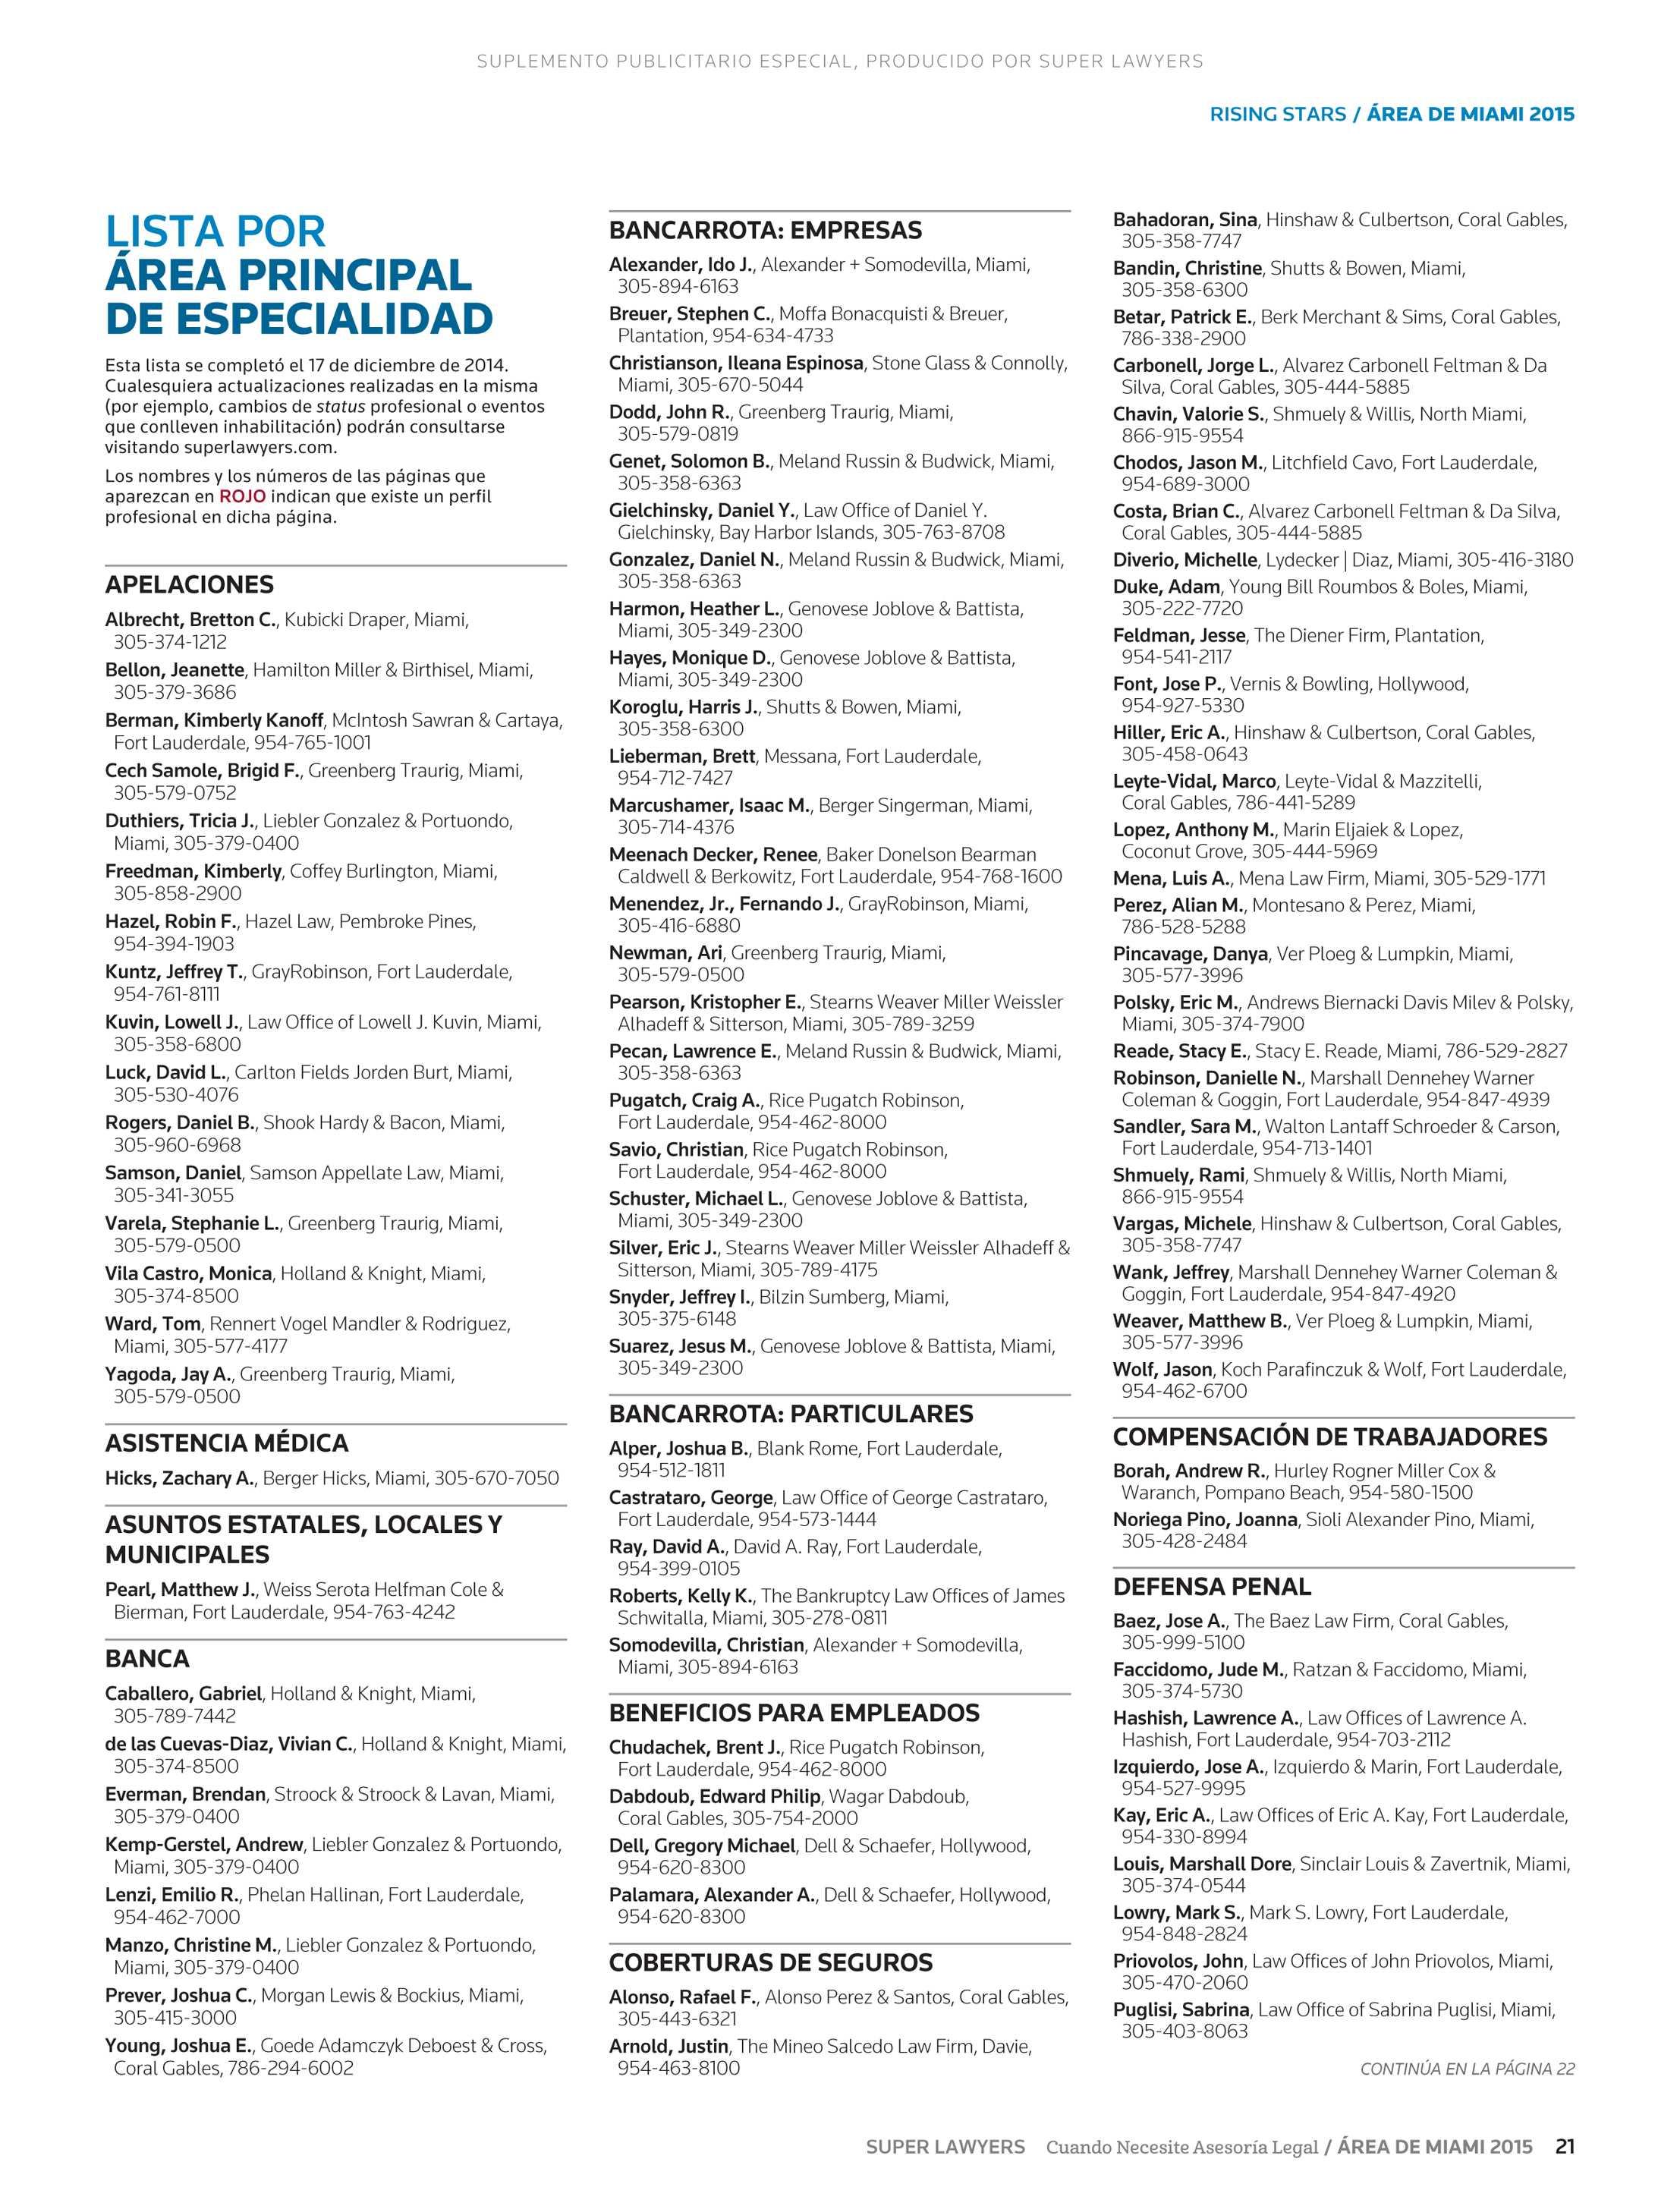 Super Lawyers - Área de Miami 2015 - page 21